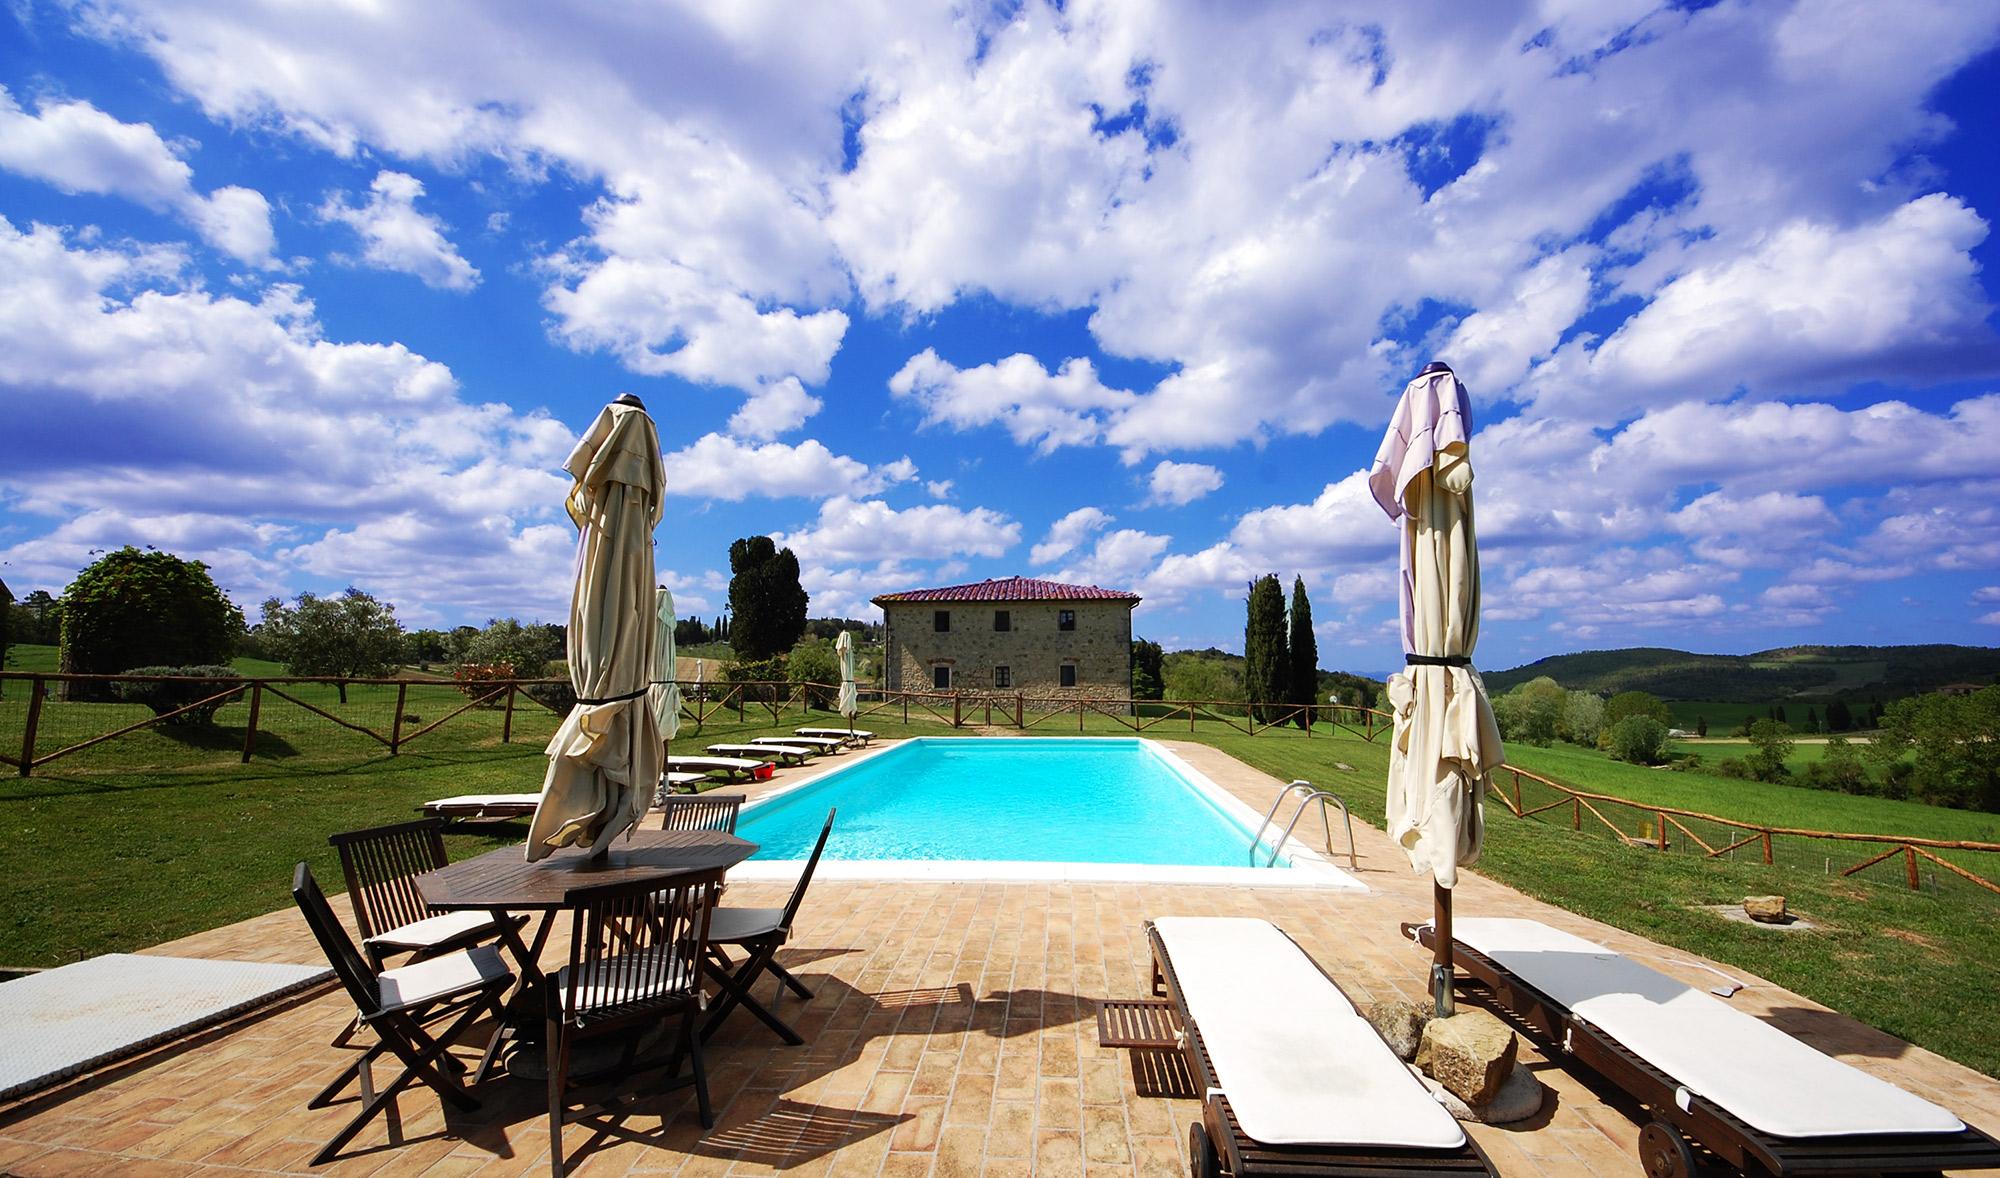 villa in tuscany housekeeper